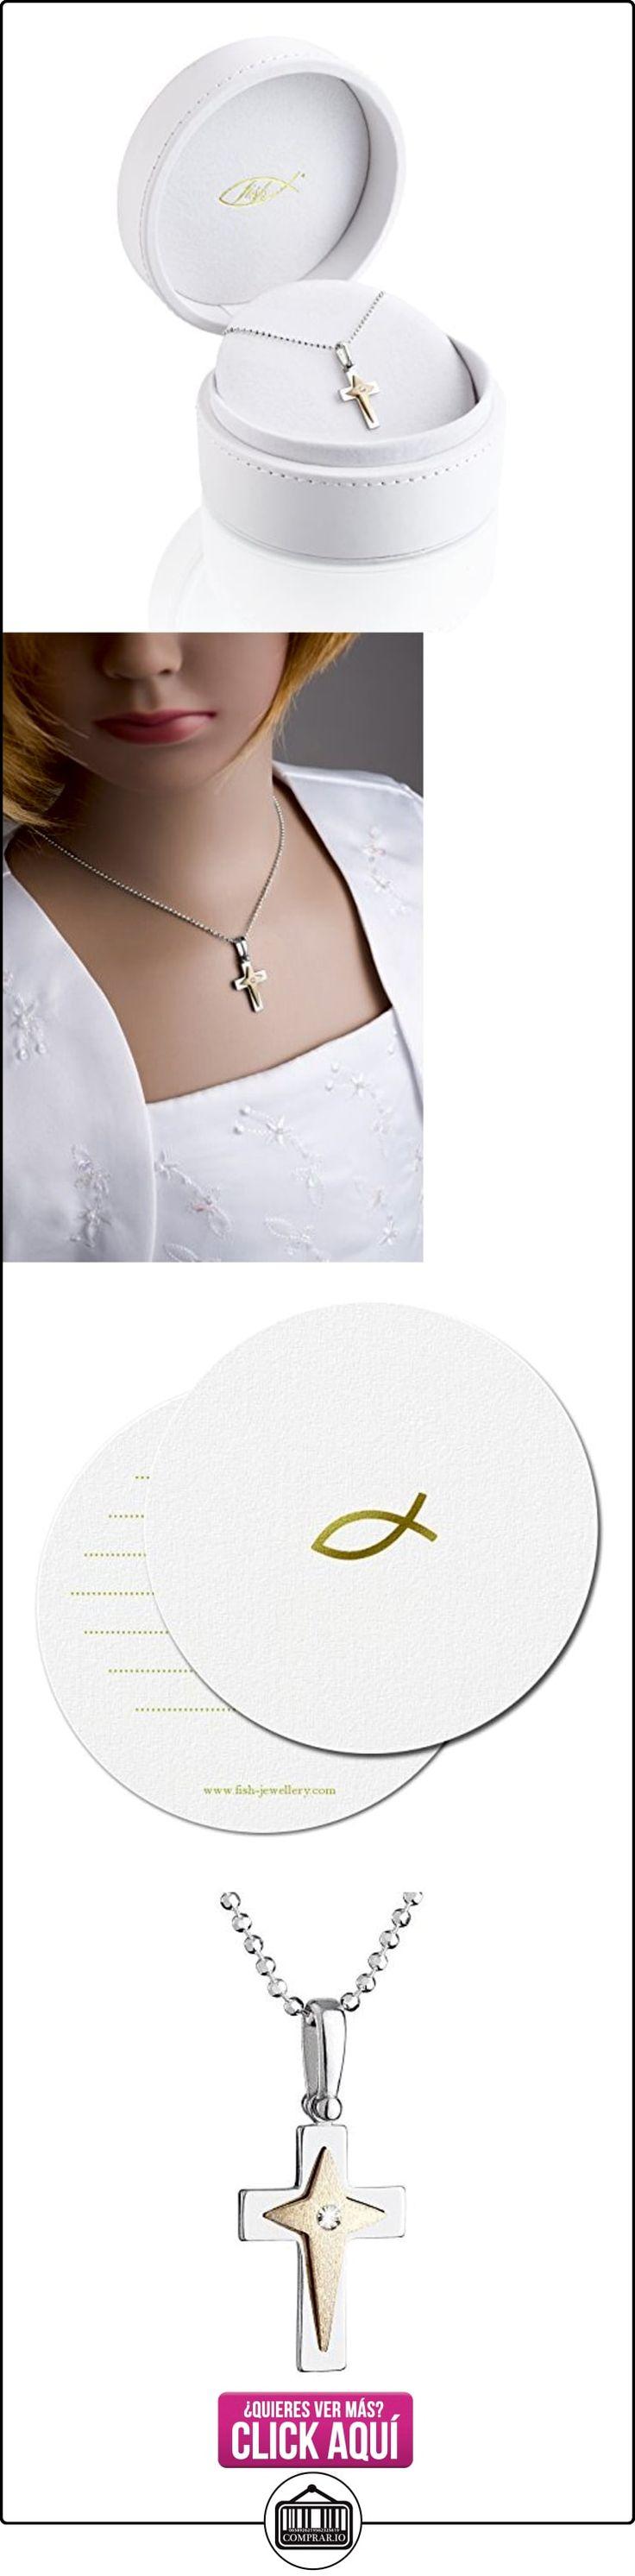 fish collar de plata para chicos, chicas, plata de ley 925 Elementos Swarovski colgante de cruz de plata dorada 42 cm  ✿ Joyas para niños - Regalos ✿ ▬► Ver oferta: https://comprar.io/goto/B01D36Z06G